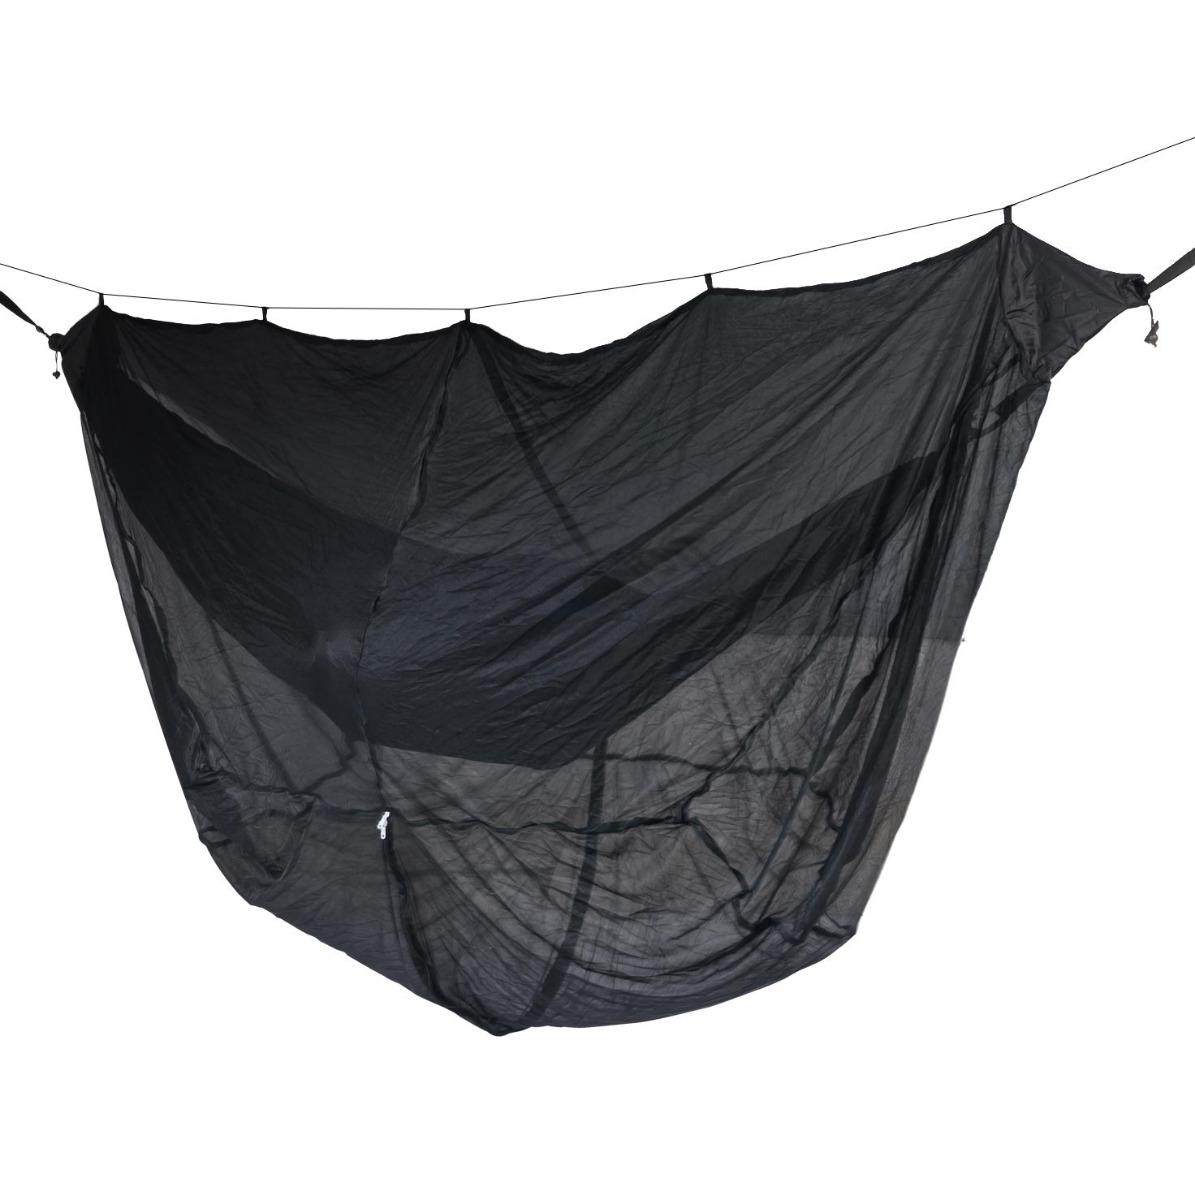 Bug Net 'Mosquito' - Tropilex �